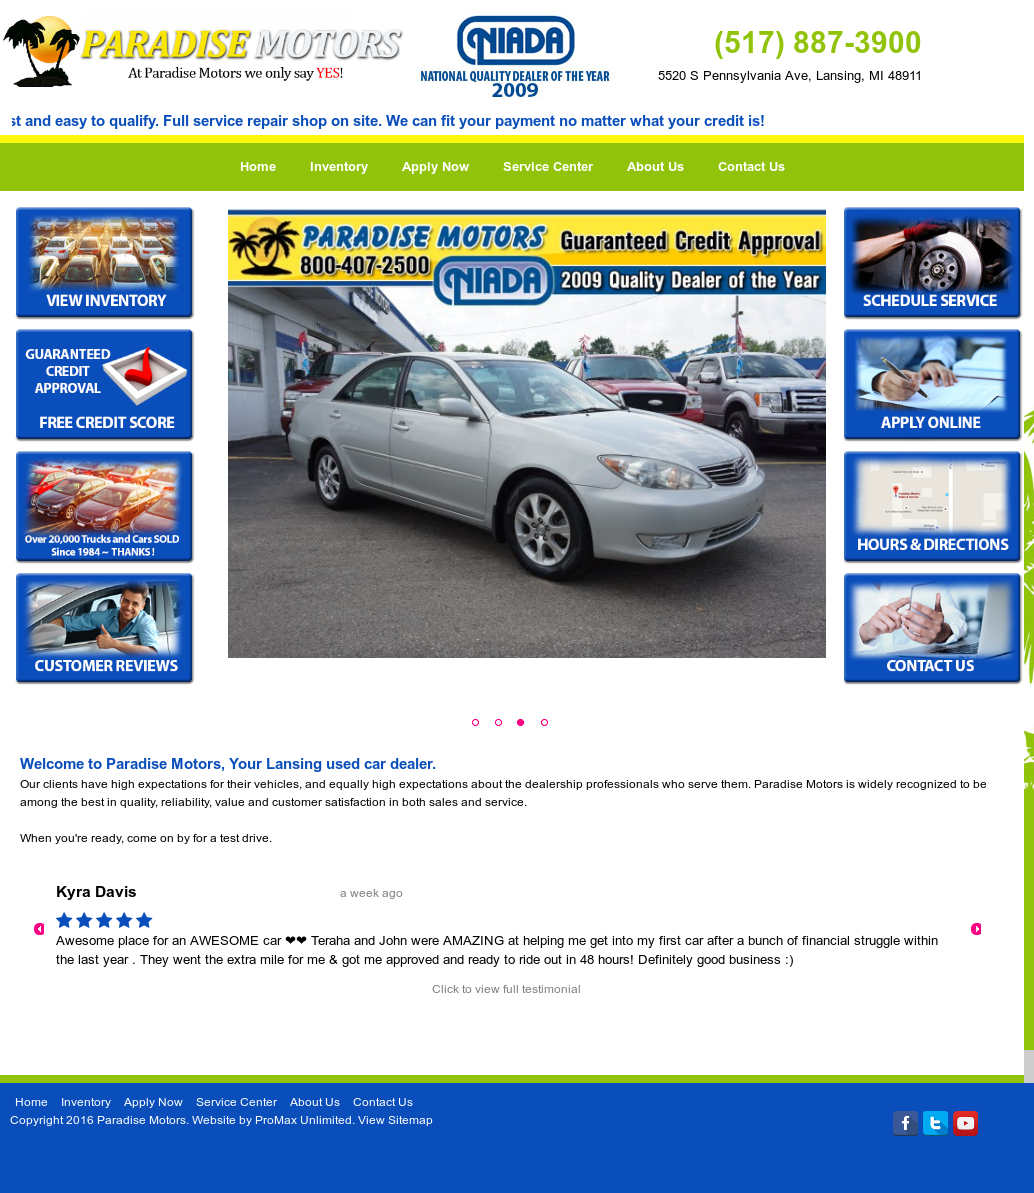 Paradisemotors Competitors, Revenue and Employees - Owler Company Profile